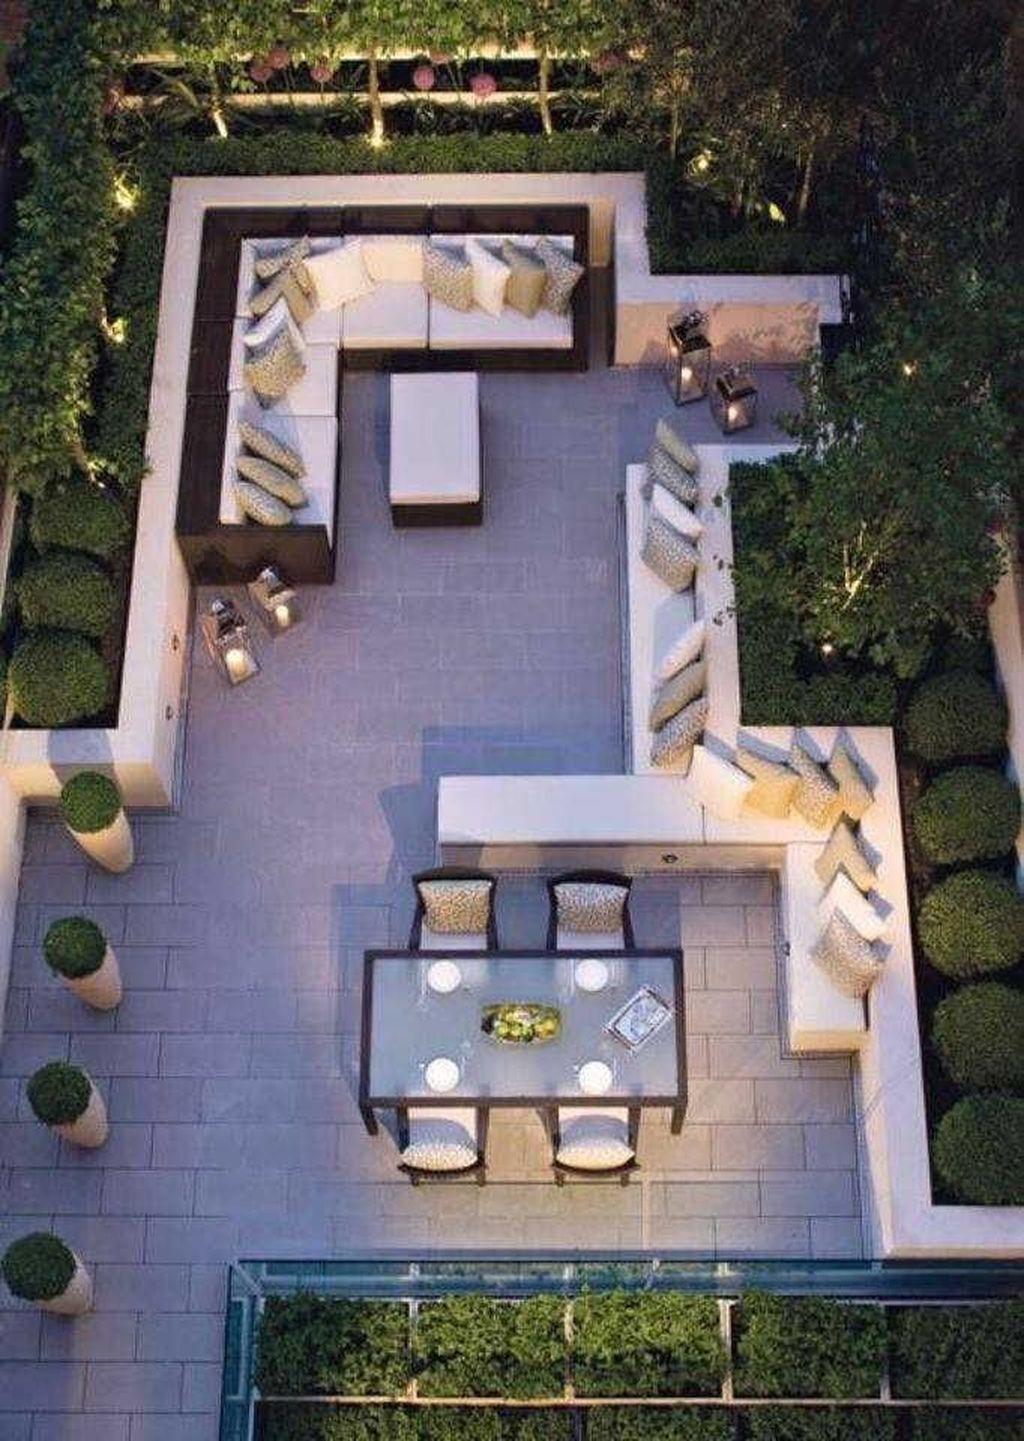 29 Awesome Modern Backyard Landscaping Ideas 18 Backyard Landscaping Designs Best Home Design Ideas In 2021 Modern Patio Patio Design Backyard Patio